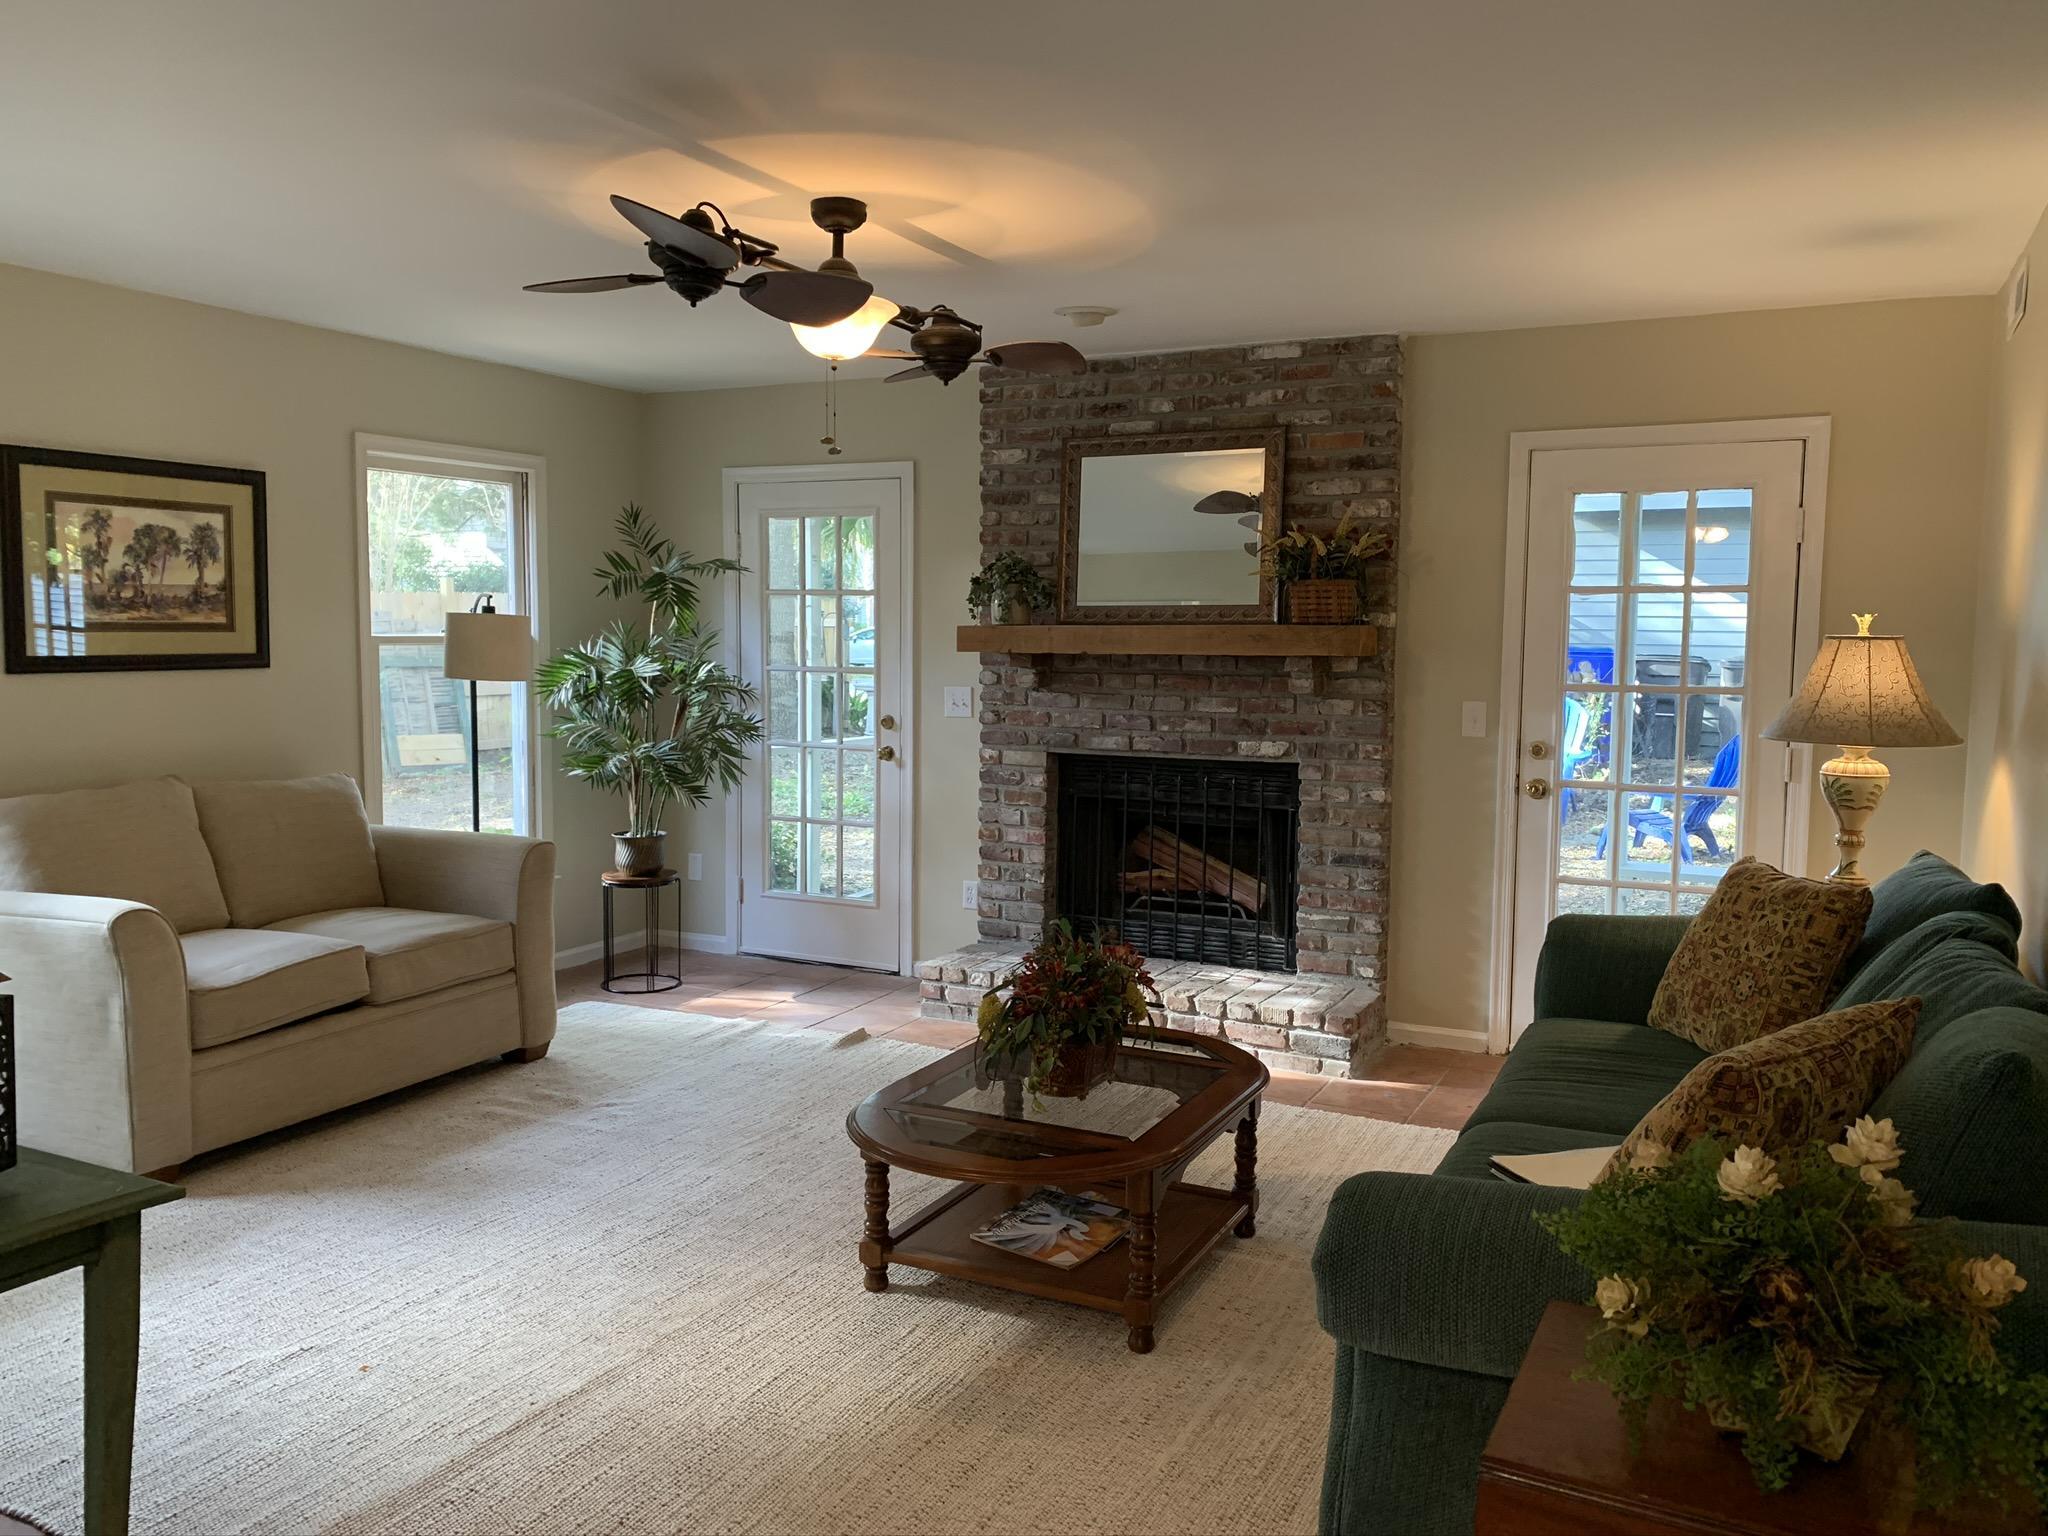 Fox Pond Homes For Sale - 662 Poaug, Mount Pleasant, SC - 11